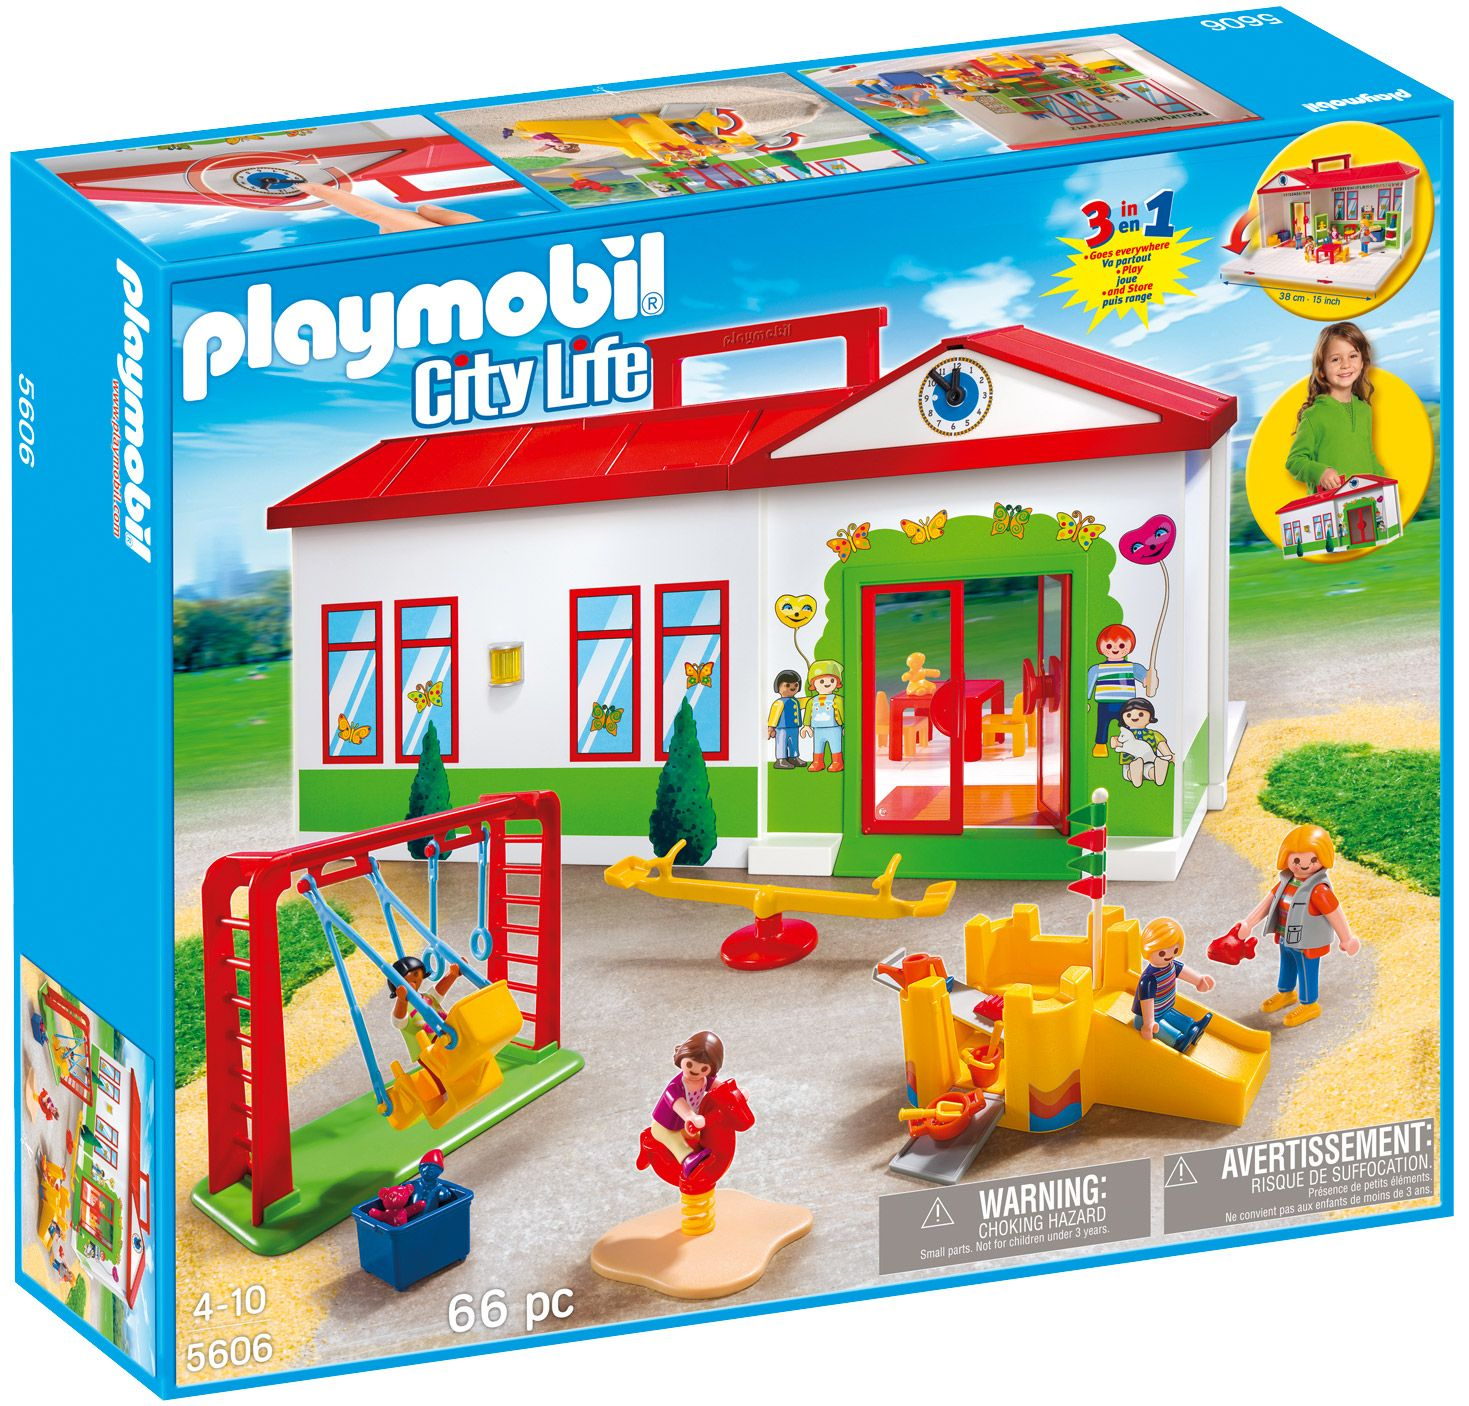 Playmobil City Life 5606 : La Garderie   Playmobil ... avec Grand Jardin D Enfant Playmobil